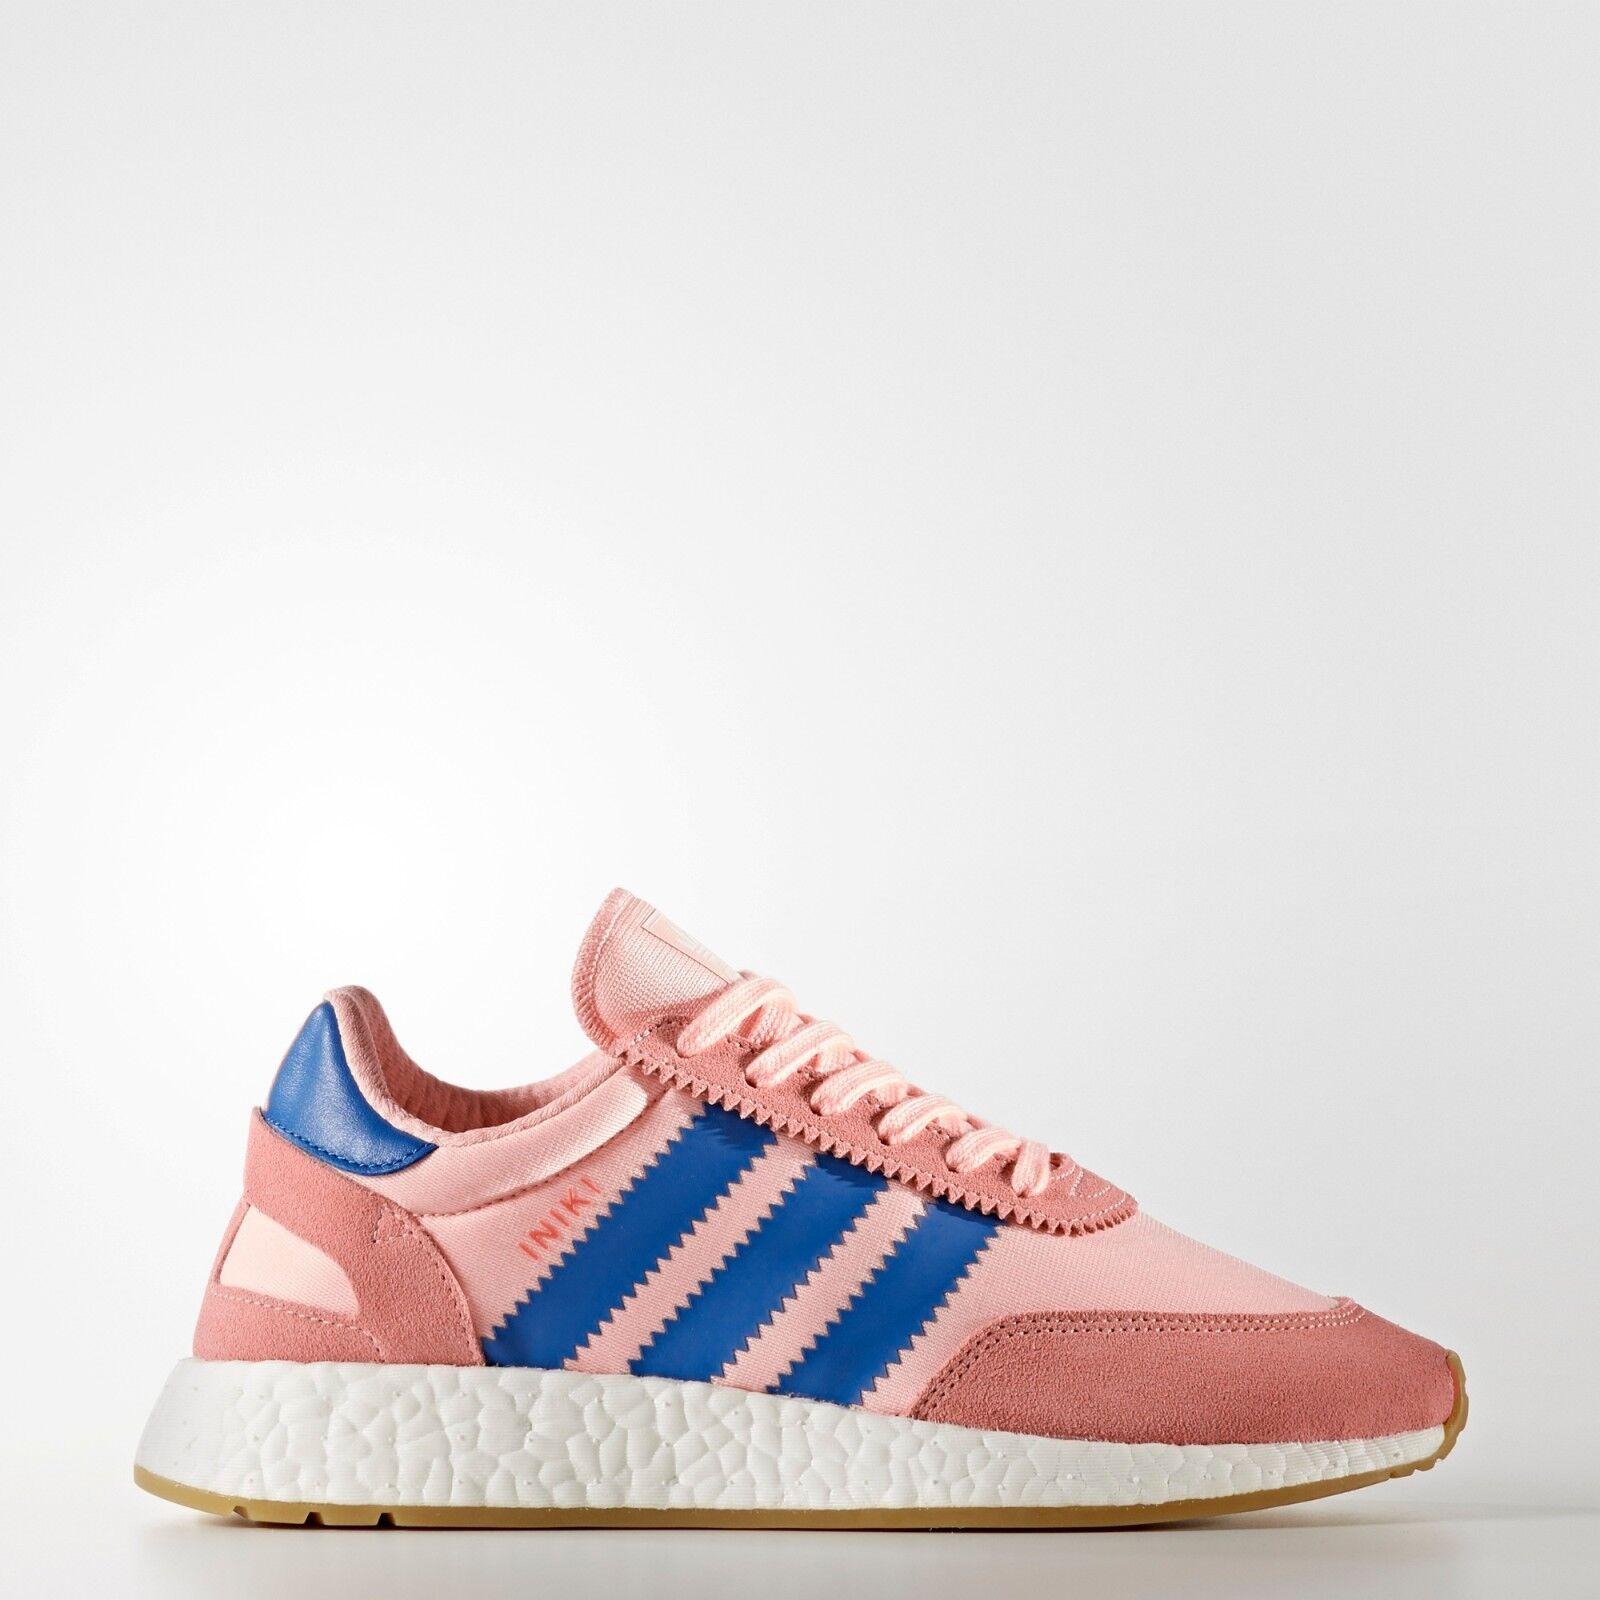 Adidas W INIKI Runner size 9. pink Pink bluee Gum. BB9999. nmd ultra boost pk